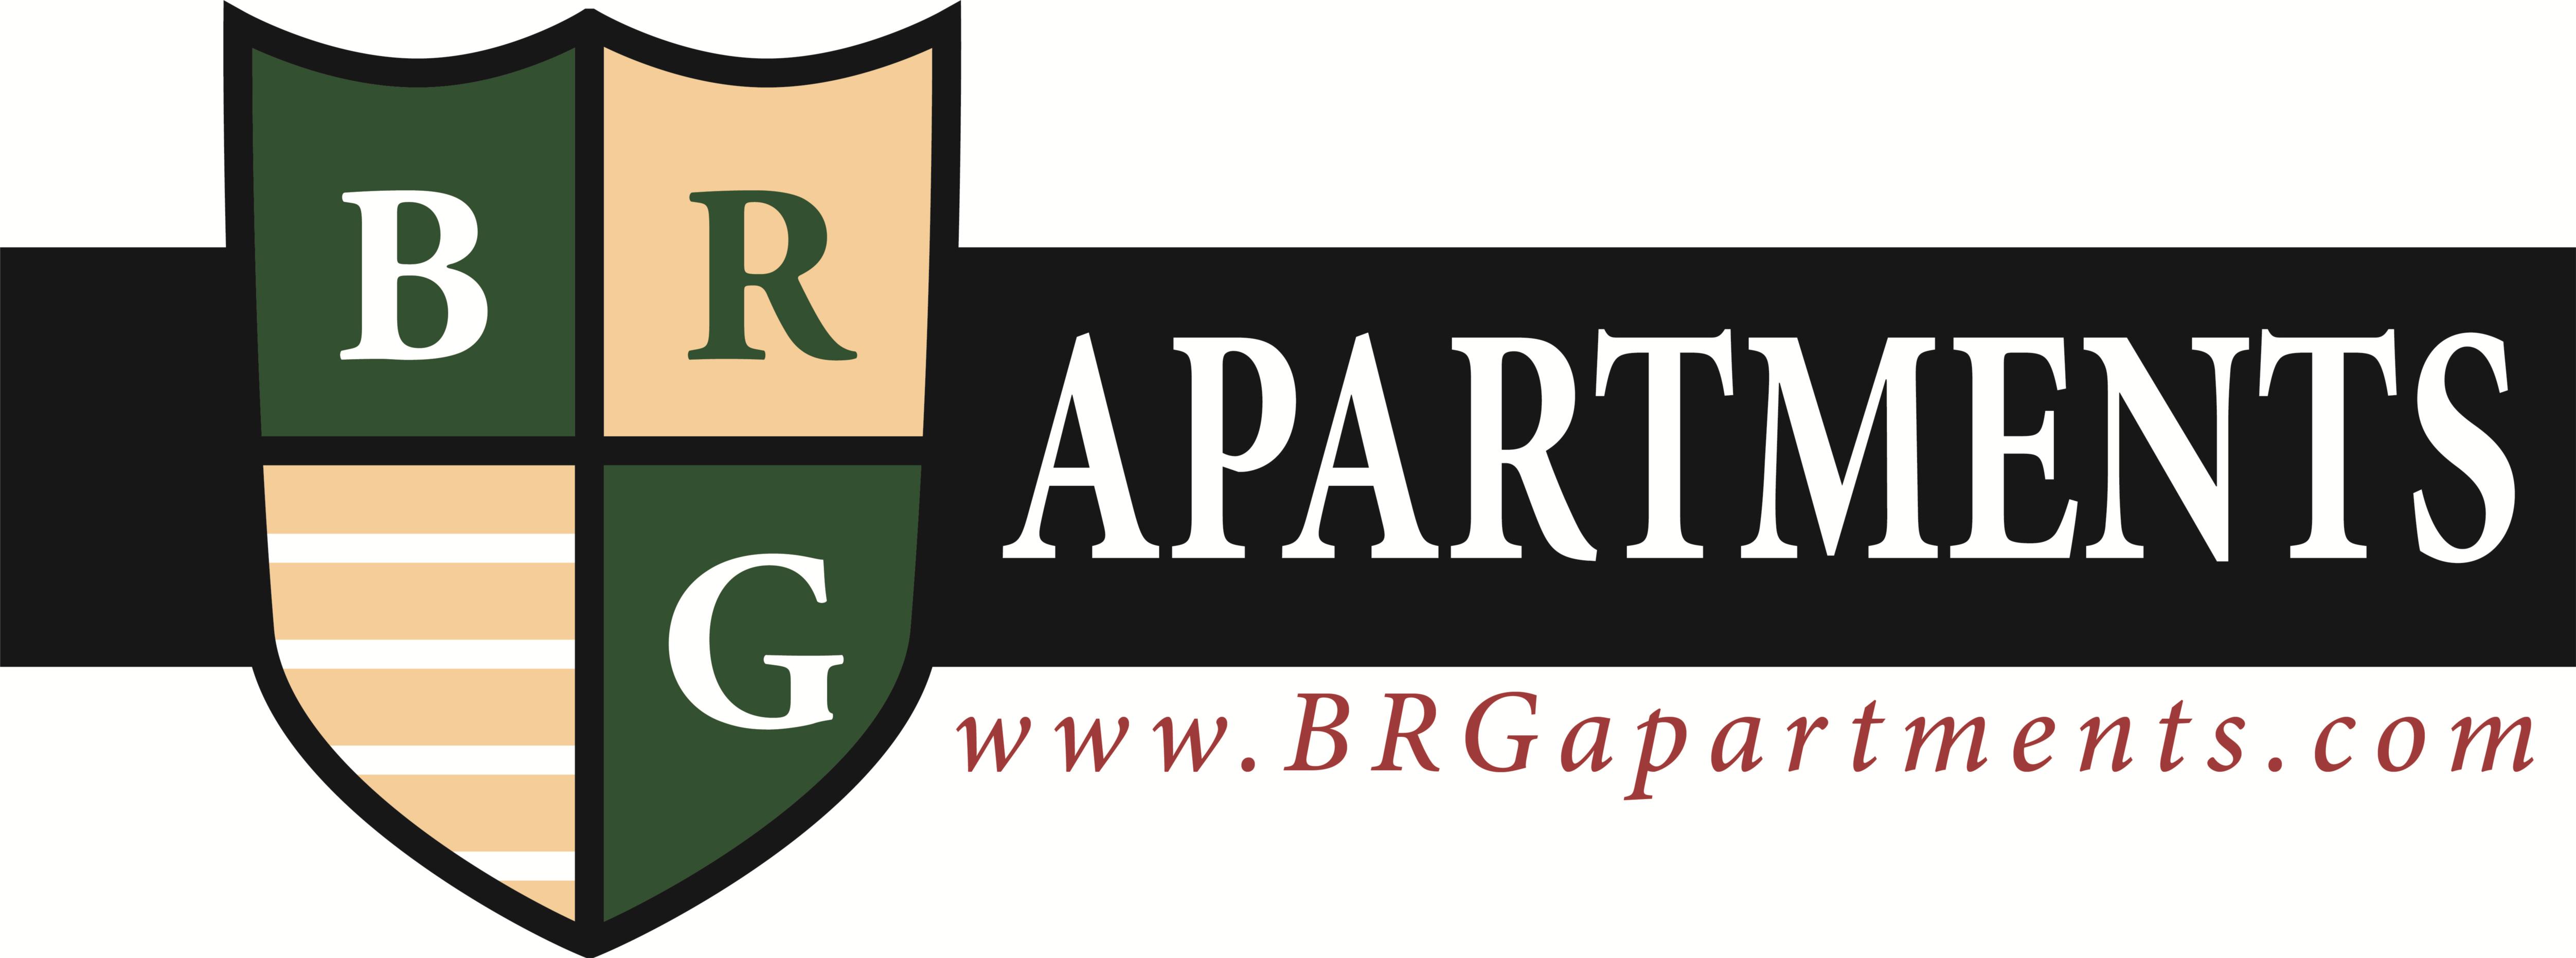 BRG Apartments logo